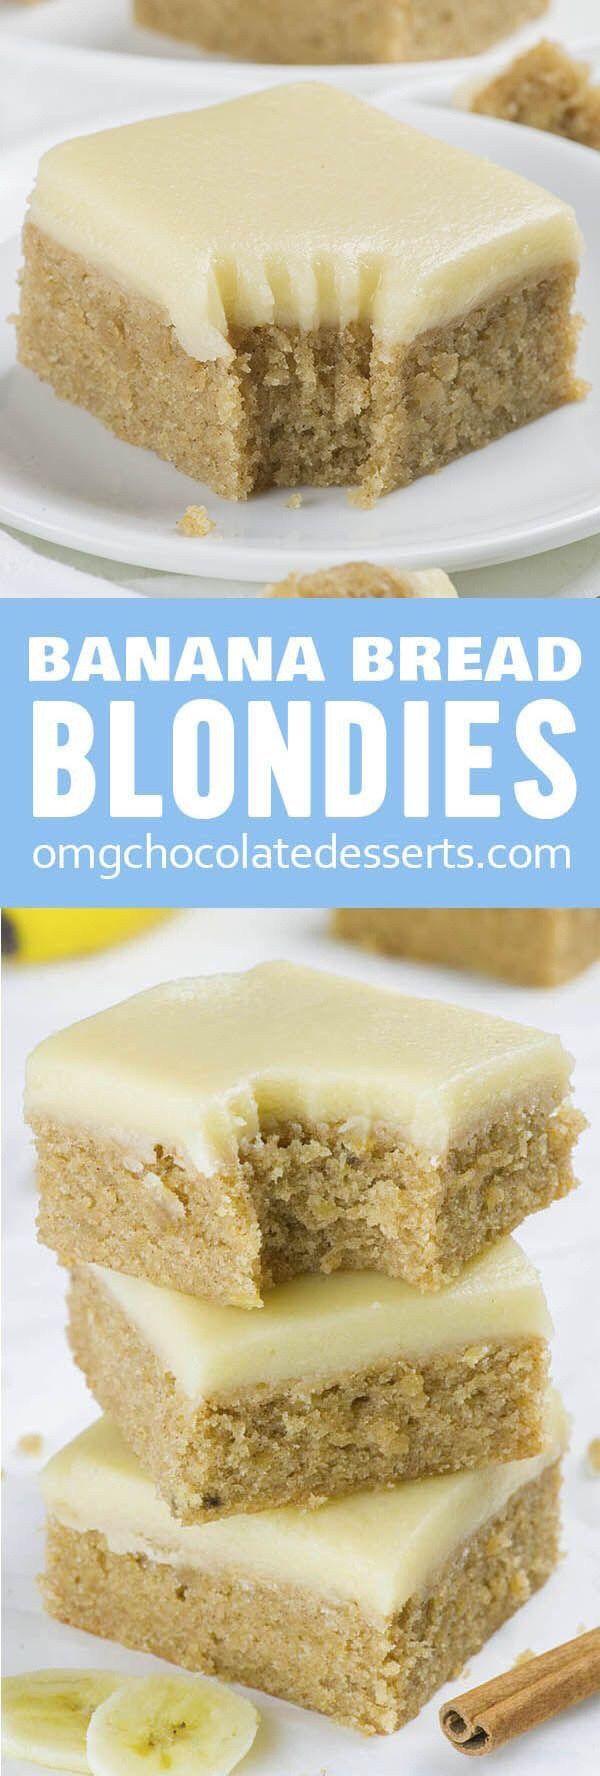 25 Beautiful Banana Recipes Breakfast  Dessert  Chief Health